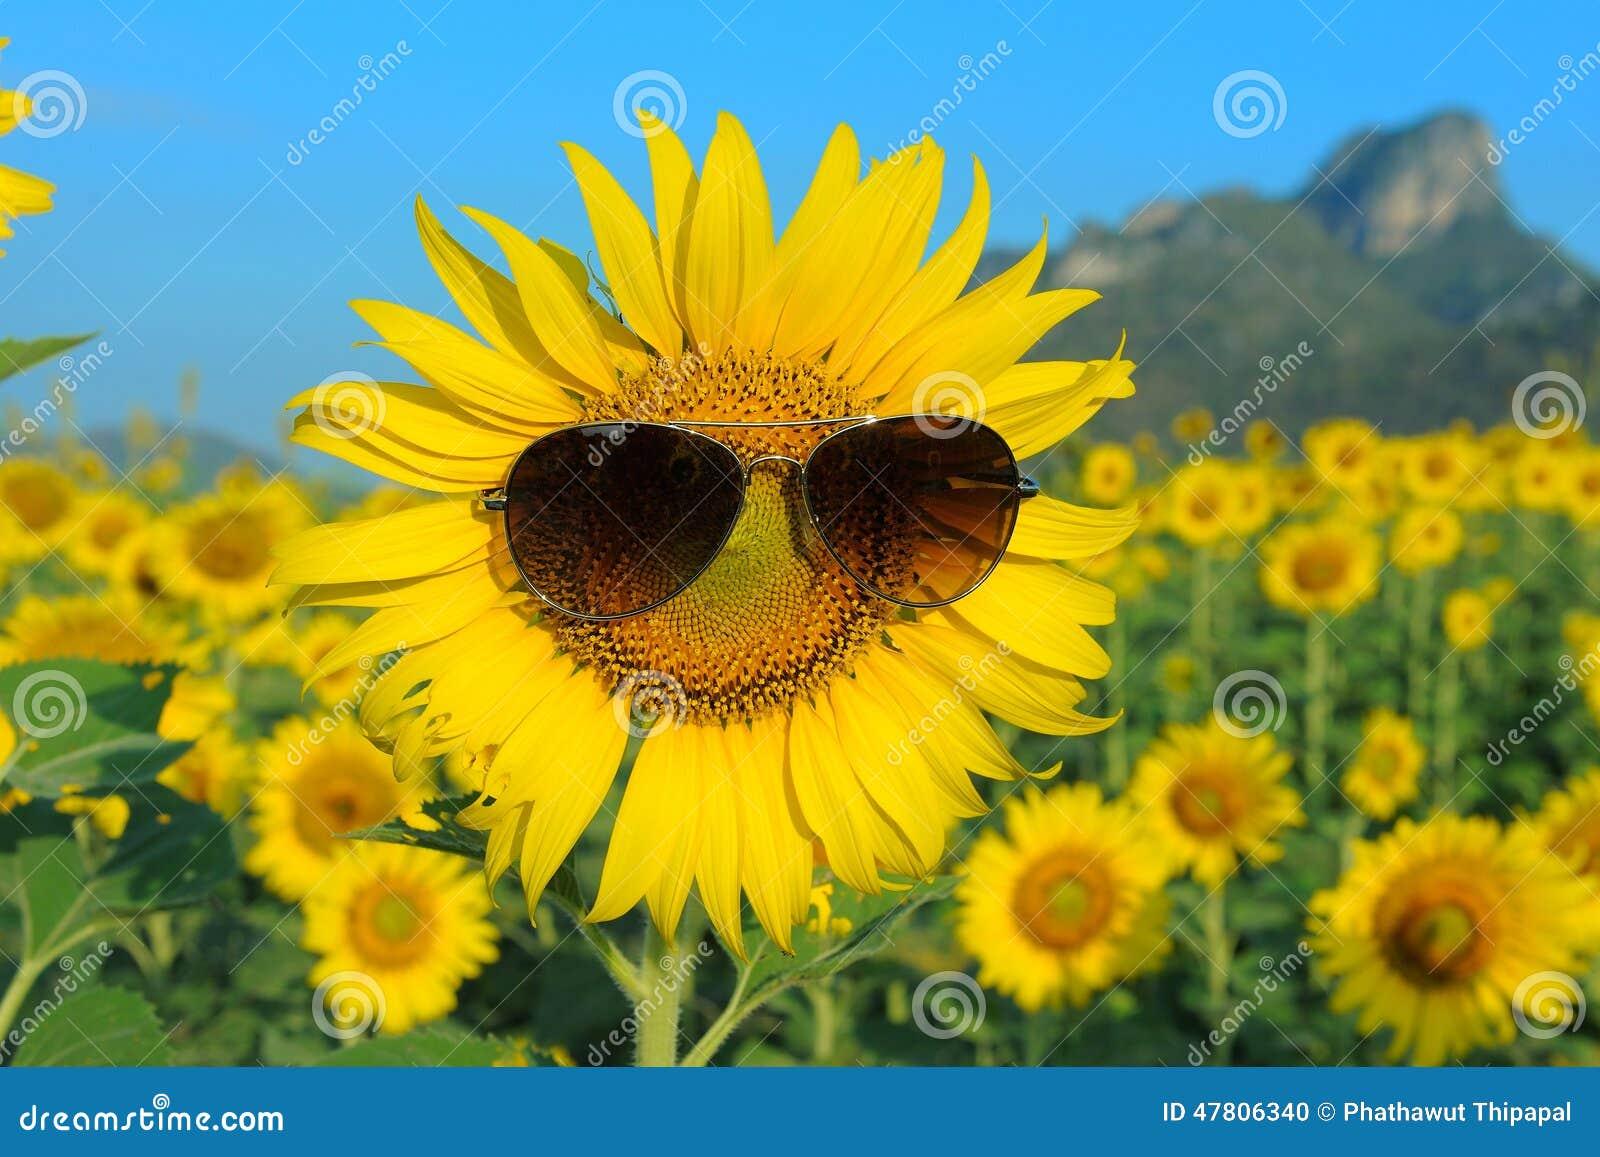 Smiley Sunflower Wearing Sunglasses Stock Photo - Image ...